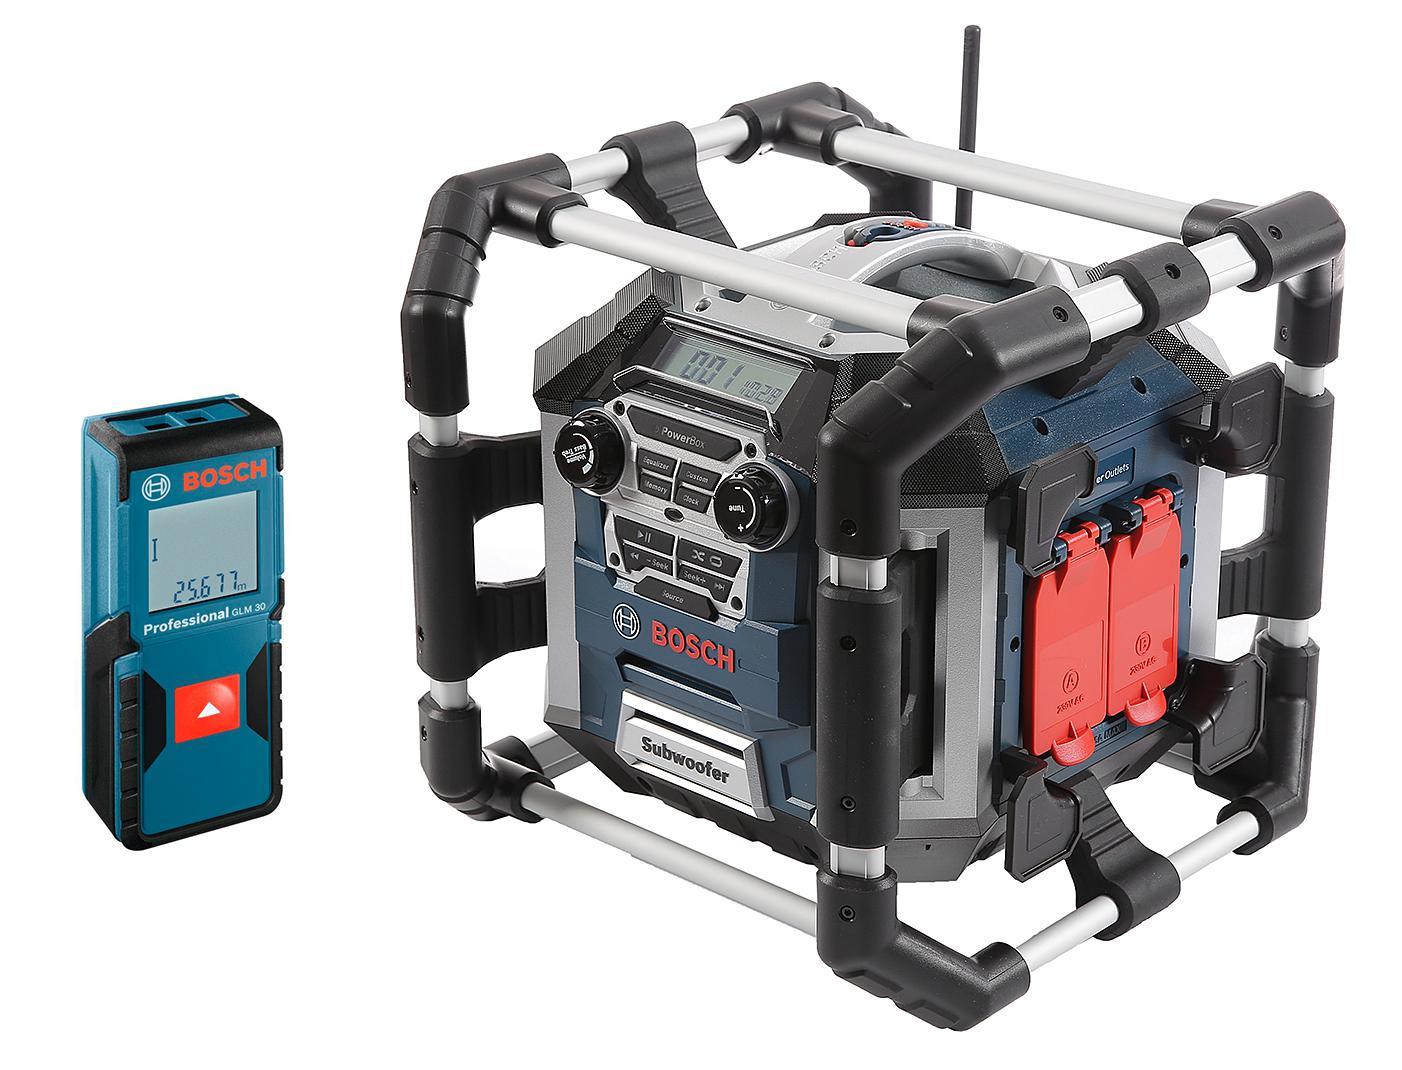 Набор Bosch Радио gml 50 power box (0.601.429.600) +Дальномер glm 30 (0.601.072.500)